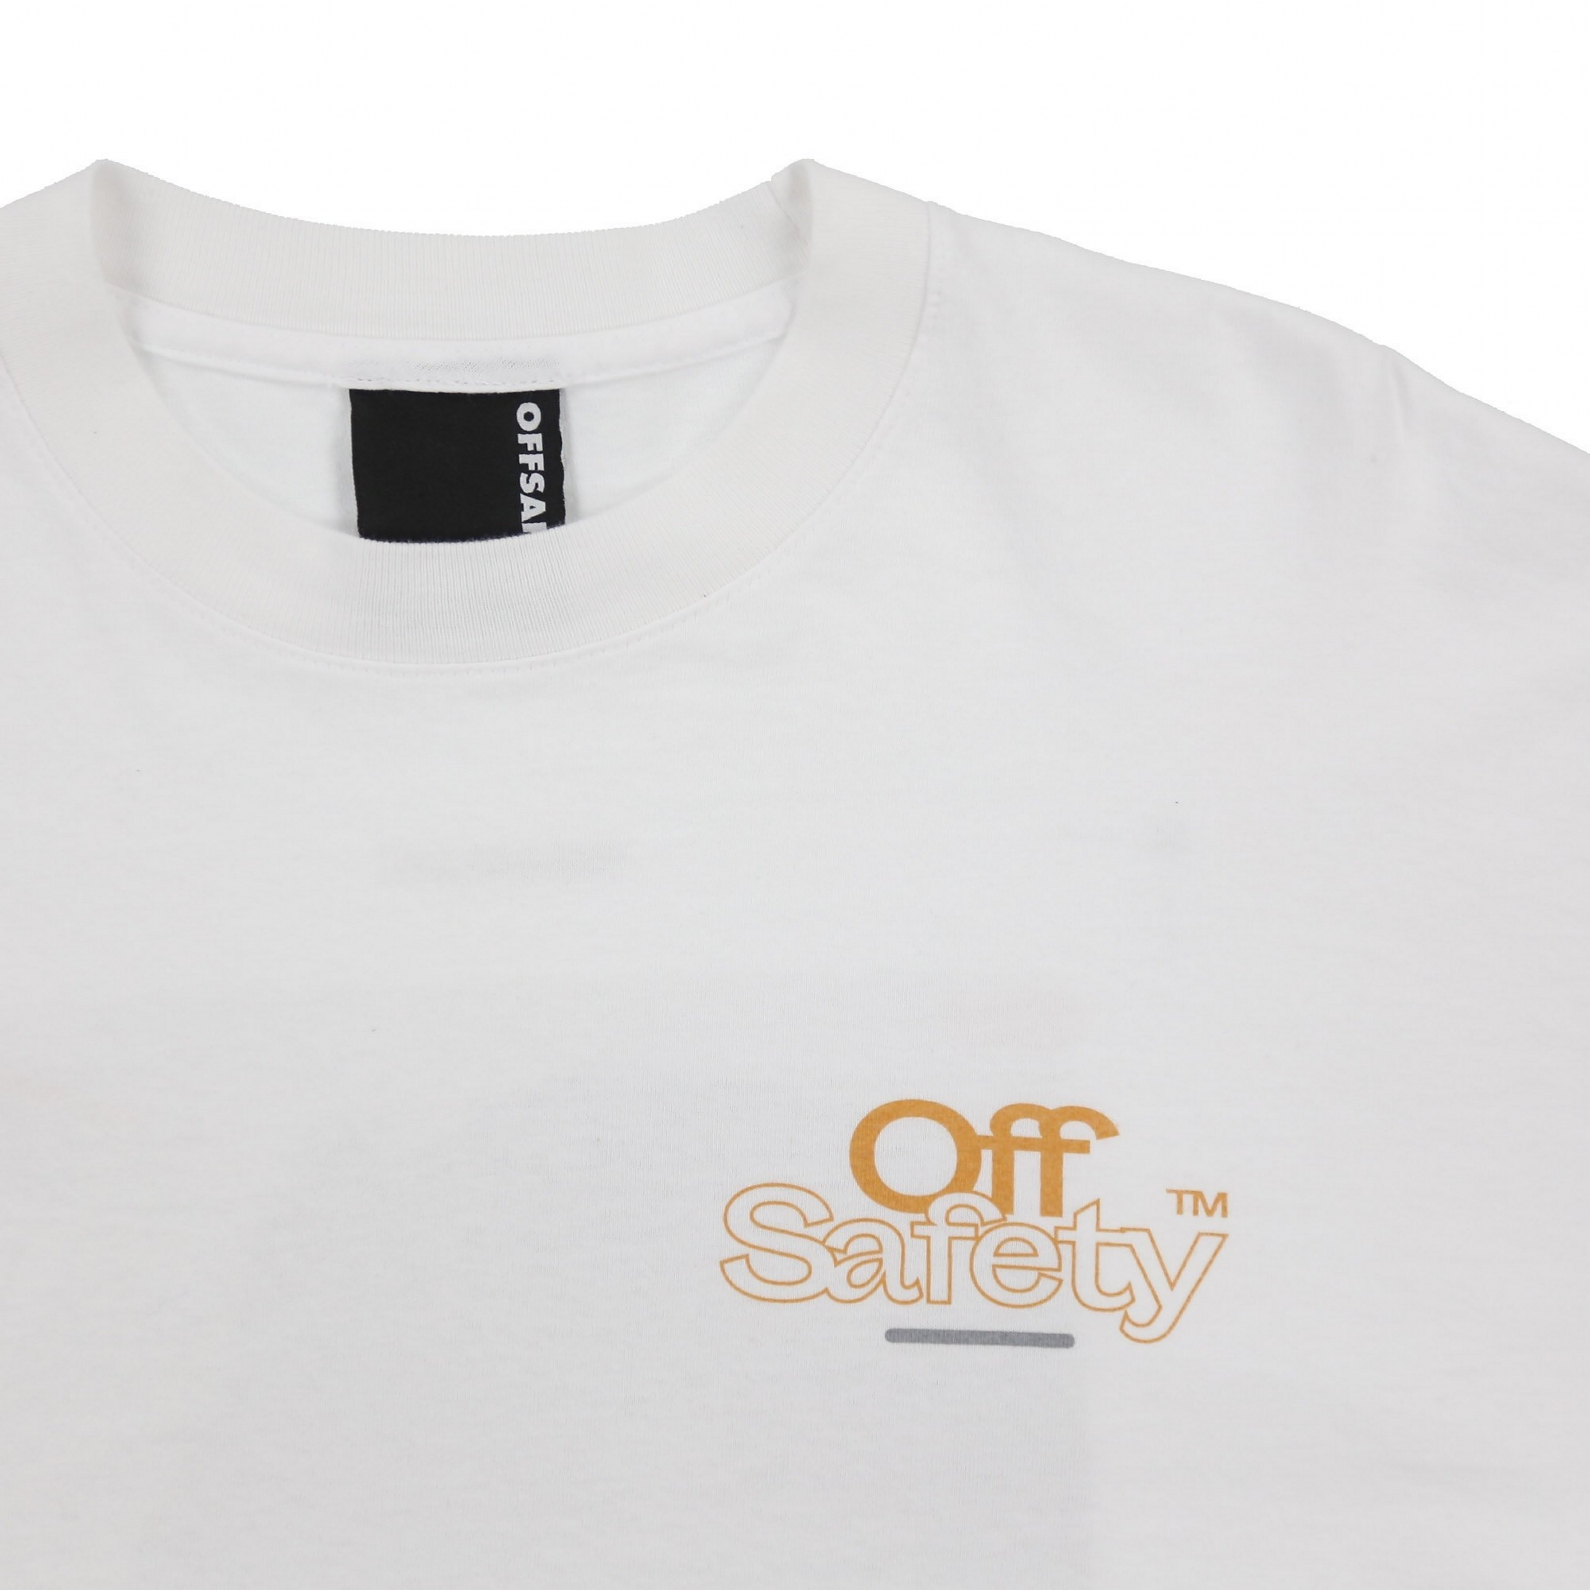 【OFF SAFETY/オフセーフティー】GUIDE LINES LS TEE 長袖Tシャツ / WHITE